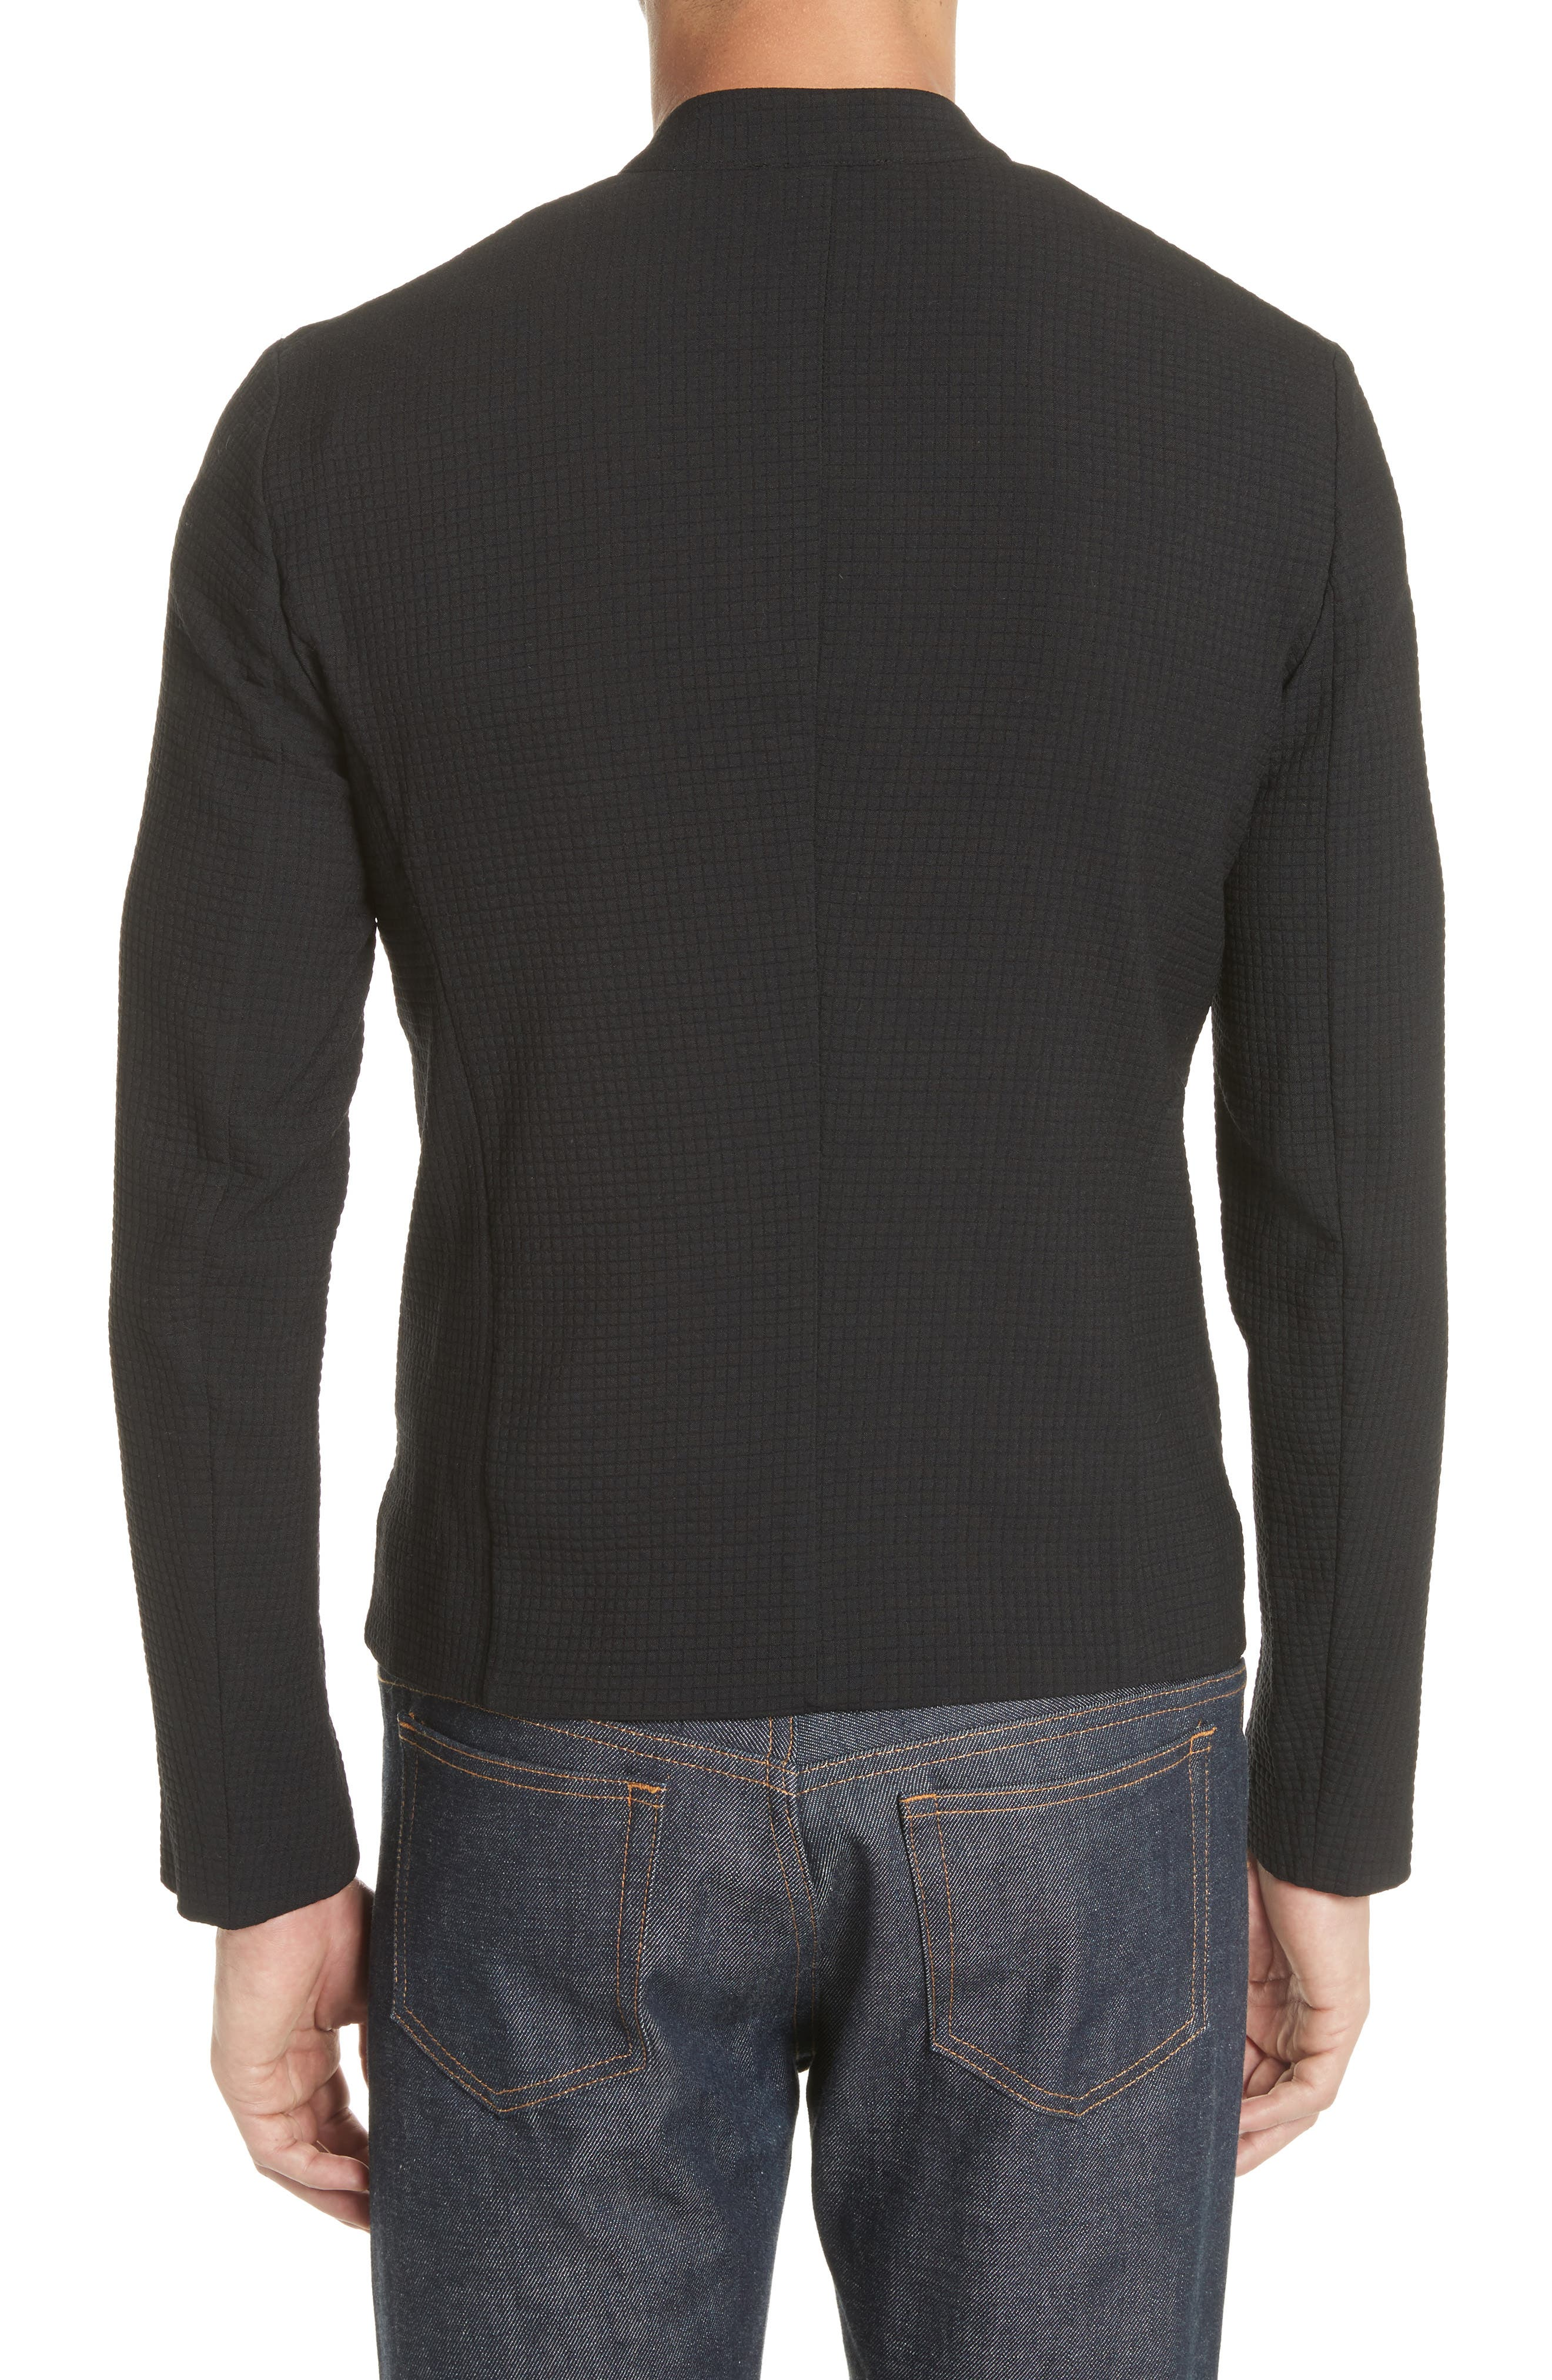 Ripstop Check Wool Blend Jacket,                             Alternate thumbnail 2, color,                             001